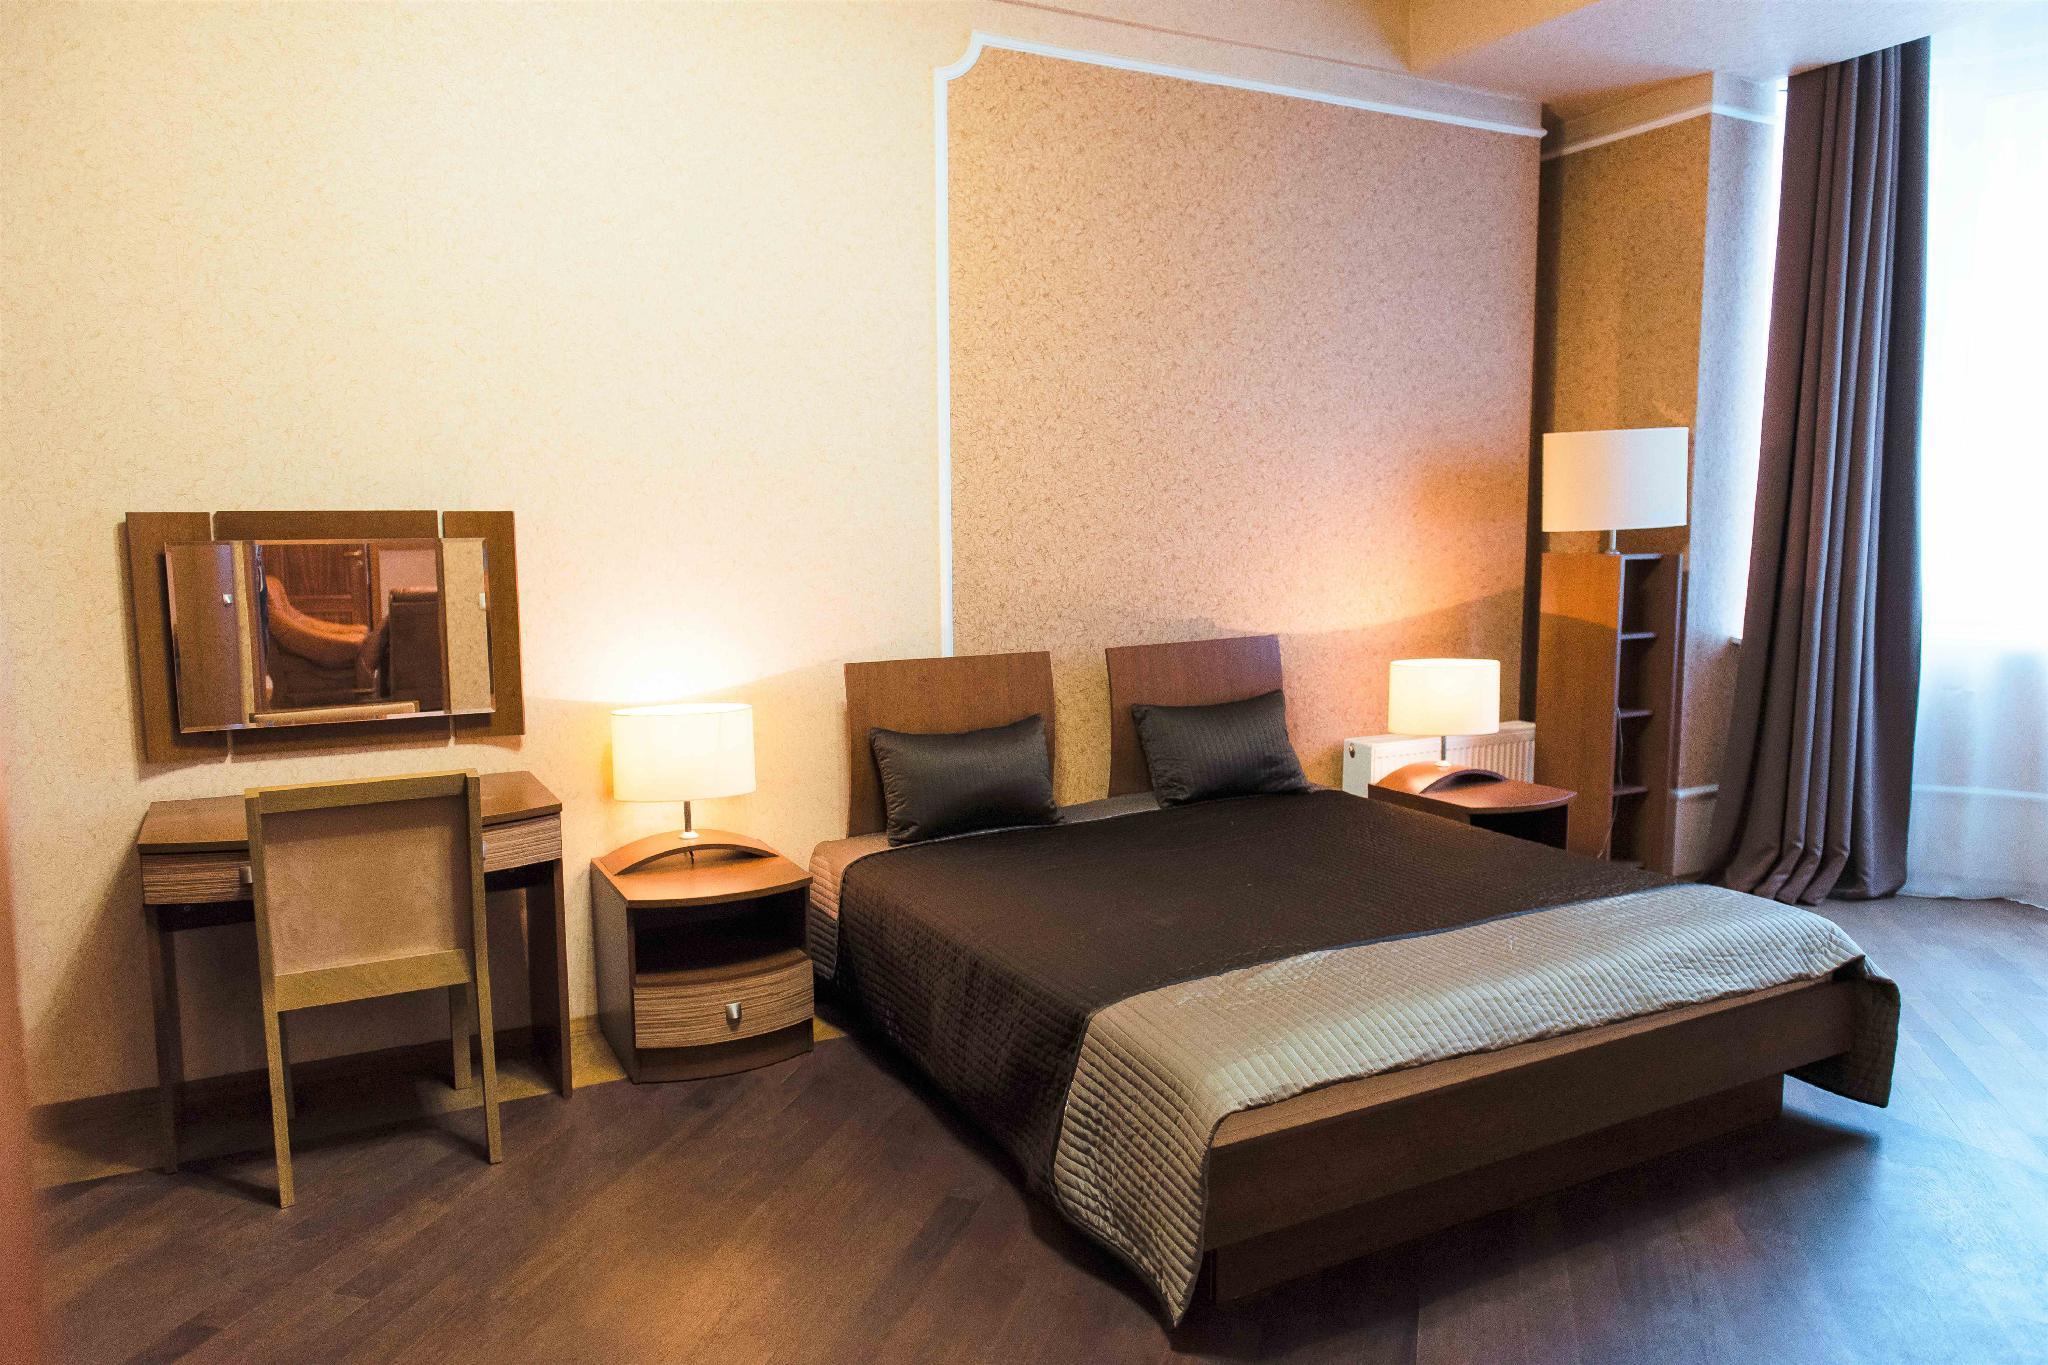 4 Room Apt. Next To King Danylo Monument